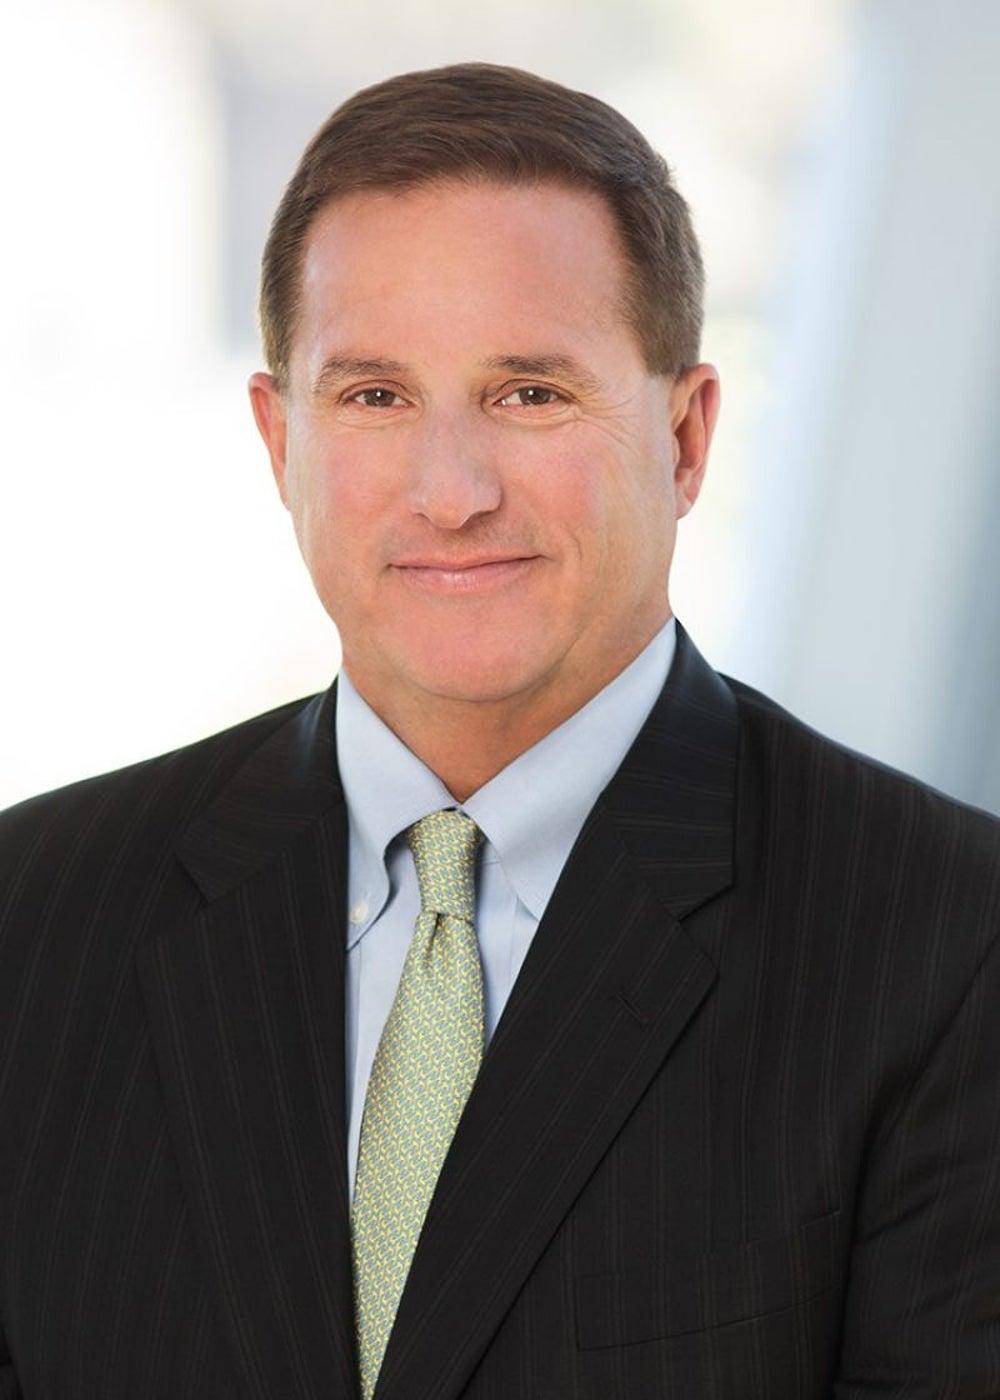 Mark Hurd, co-CEO of Oracle -- $41.1 million